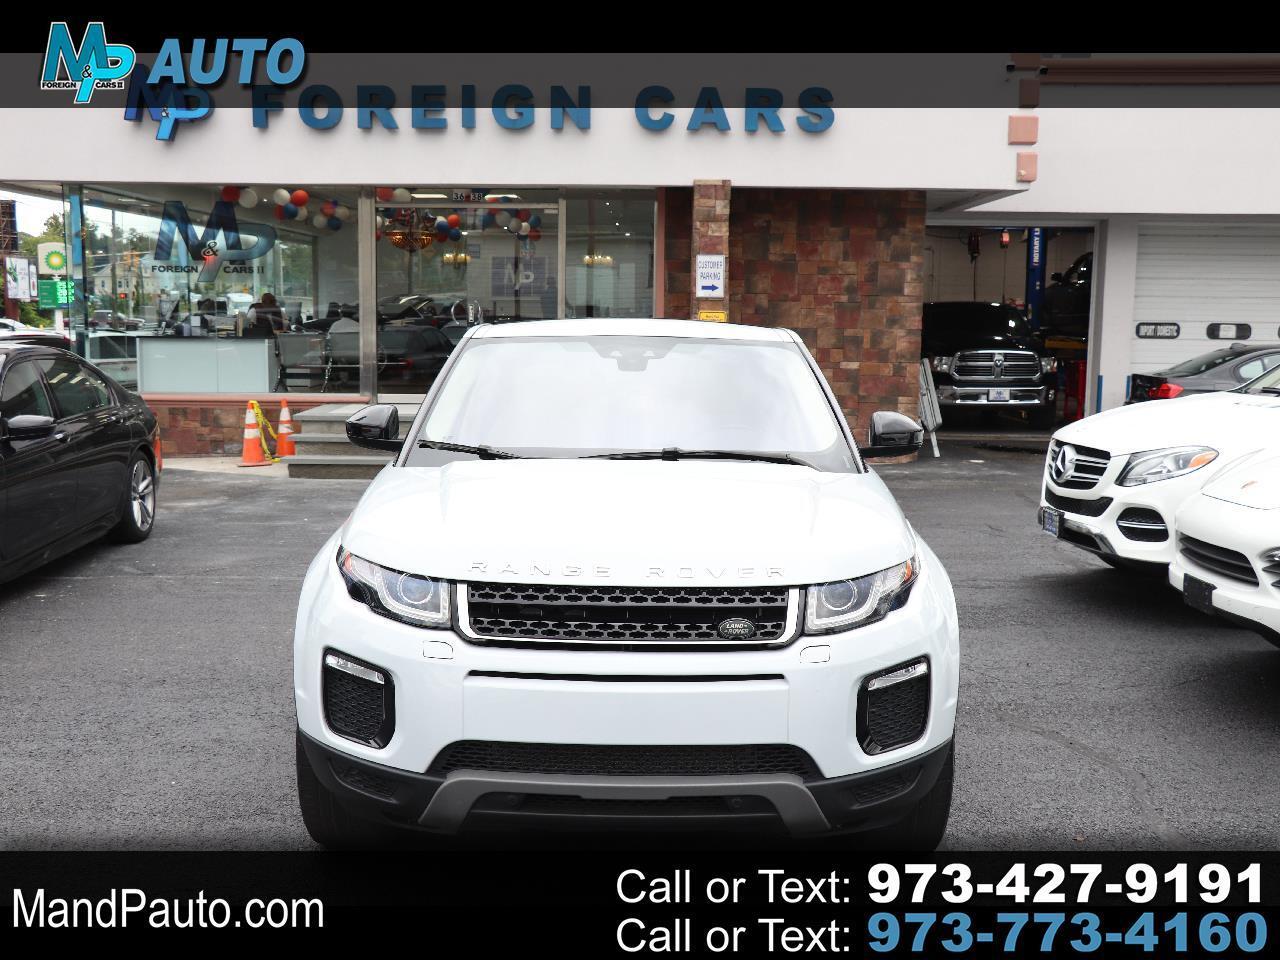 2017 Land Rover Range Rover Evoque 5 Door SE